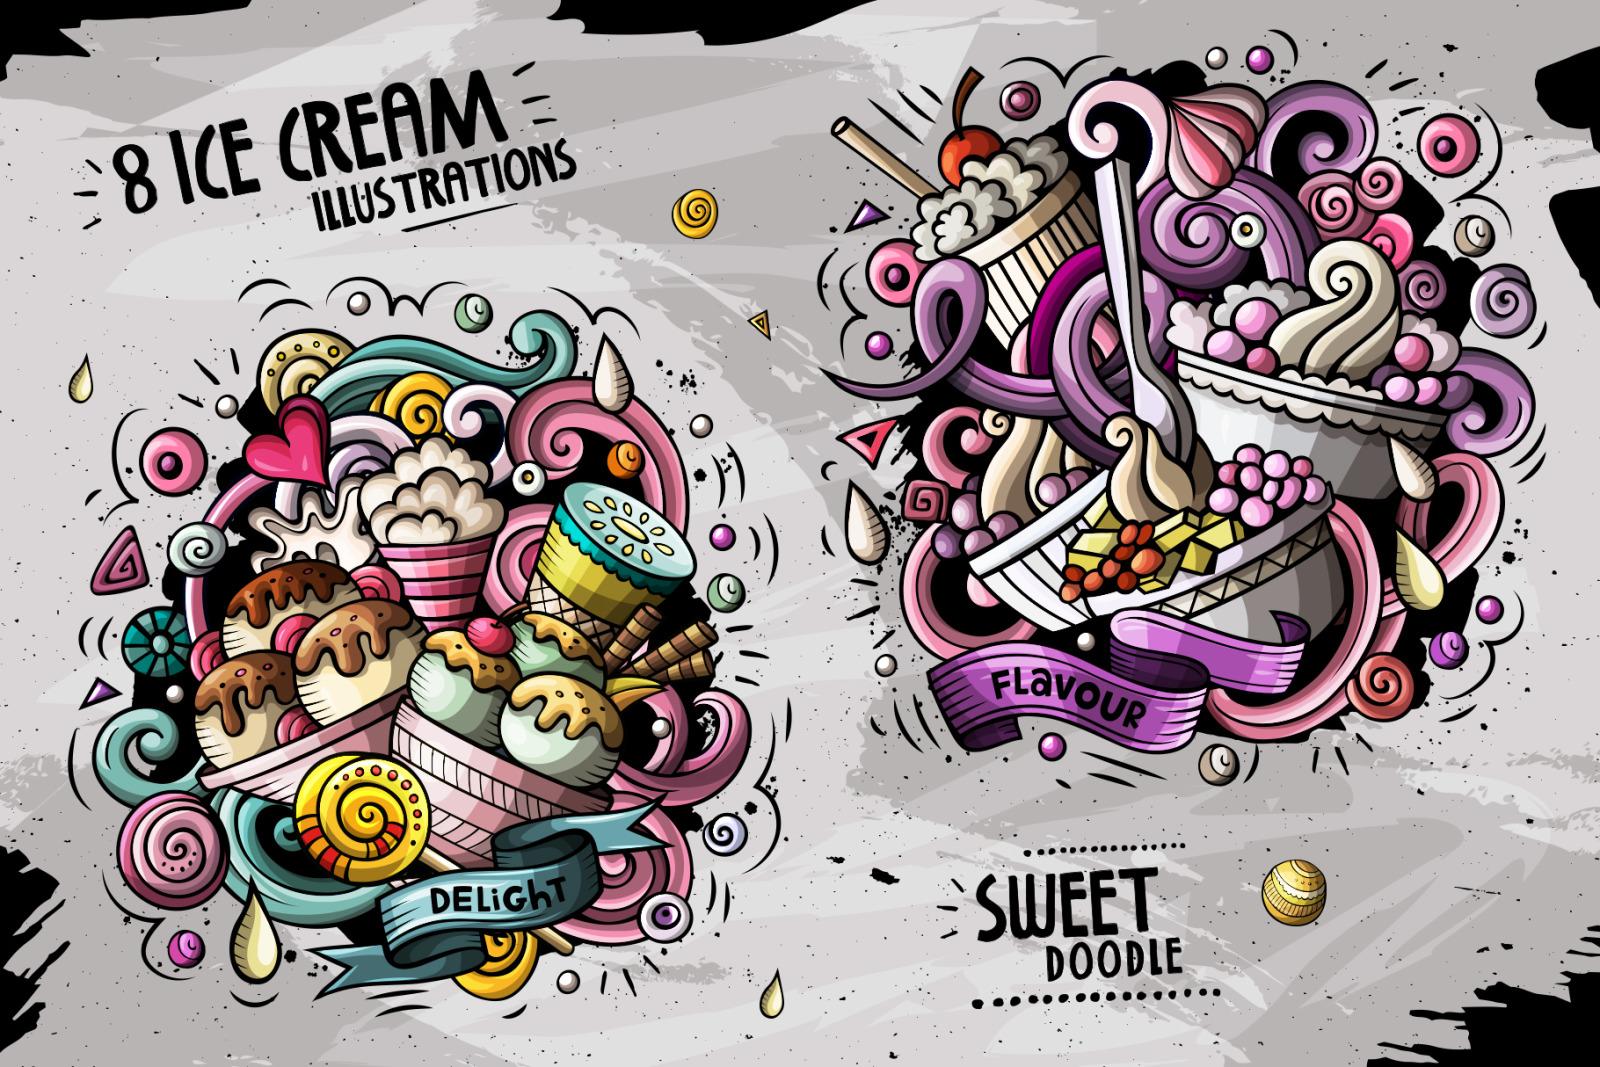 8 Ice Cream Cartoon Doodle Compositions